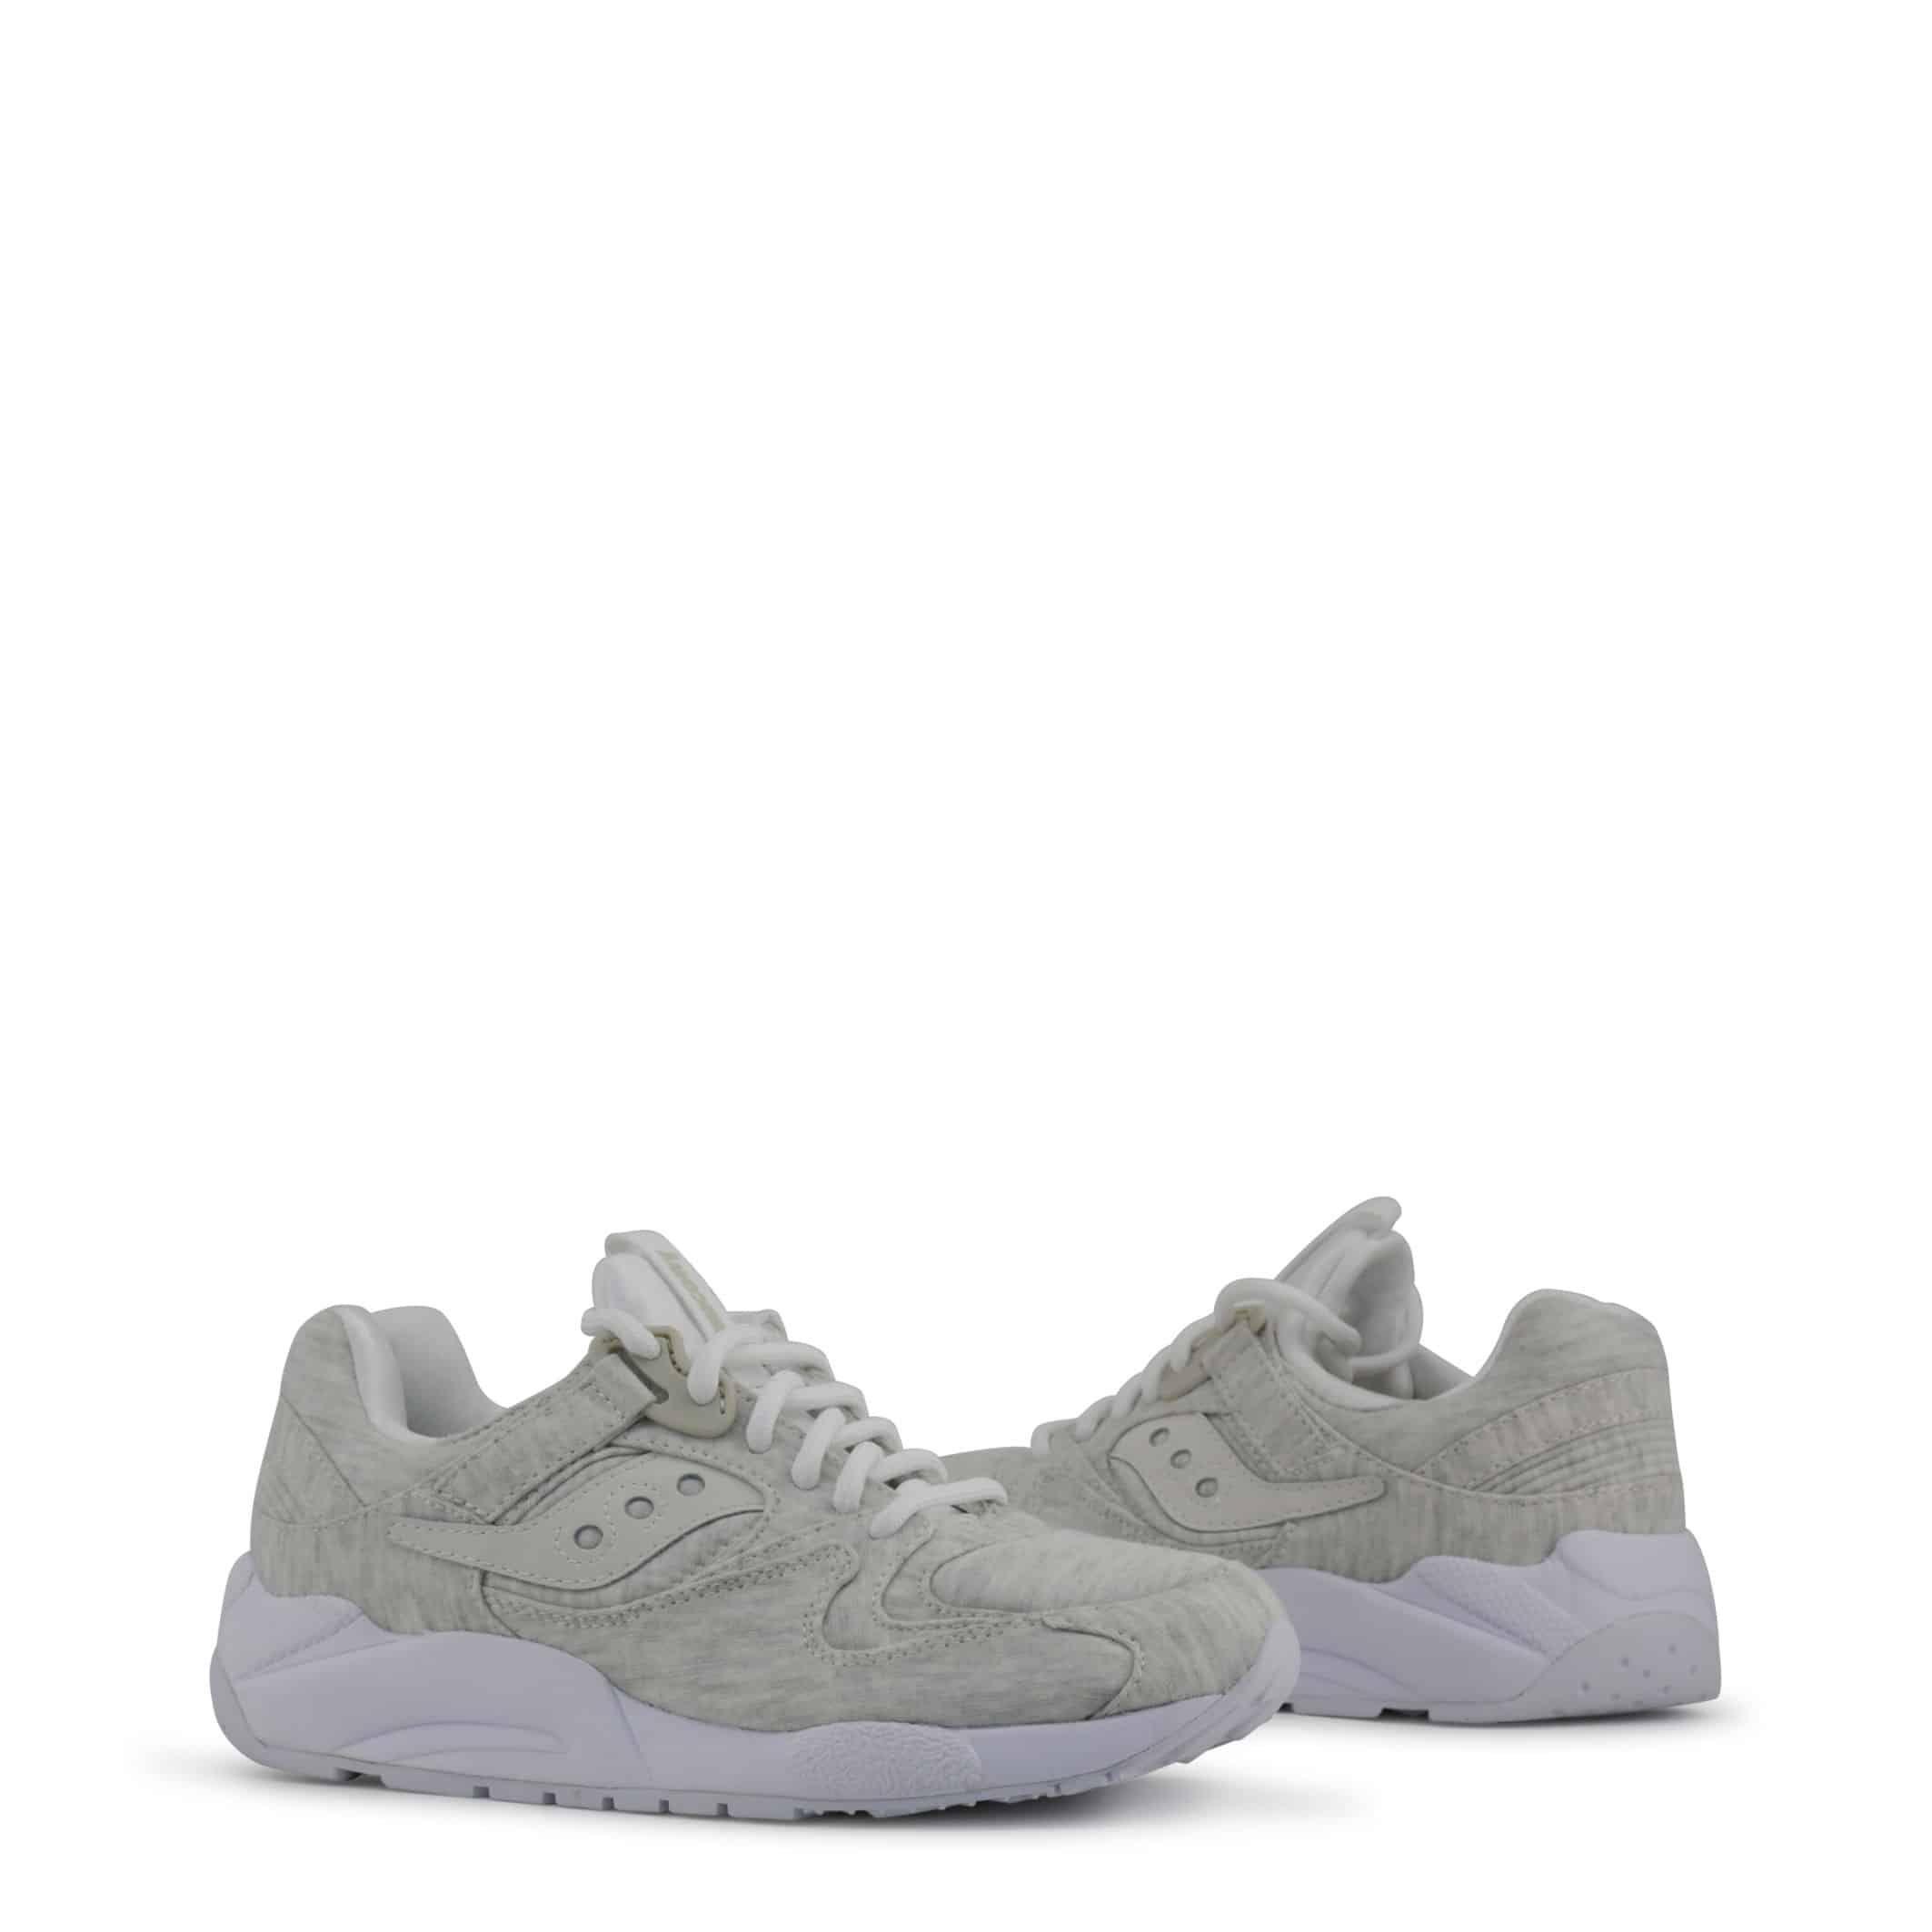 Sneakers Saucony – GRID-9000-HT_S70348